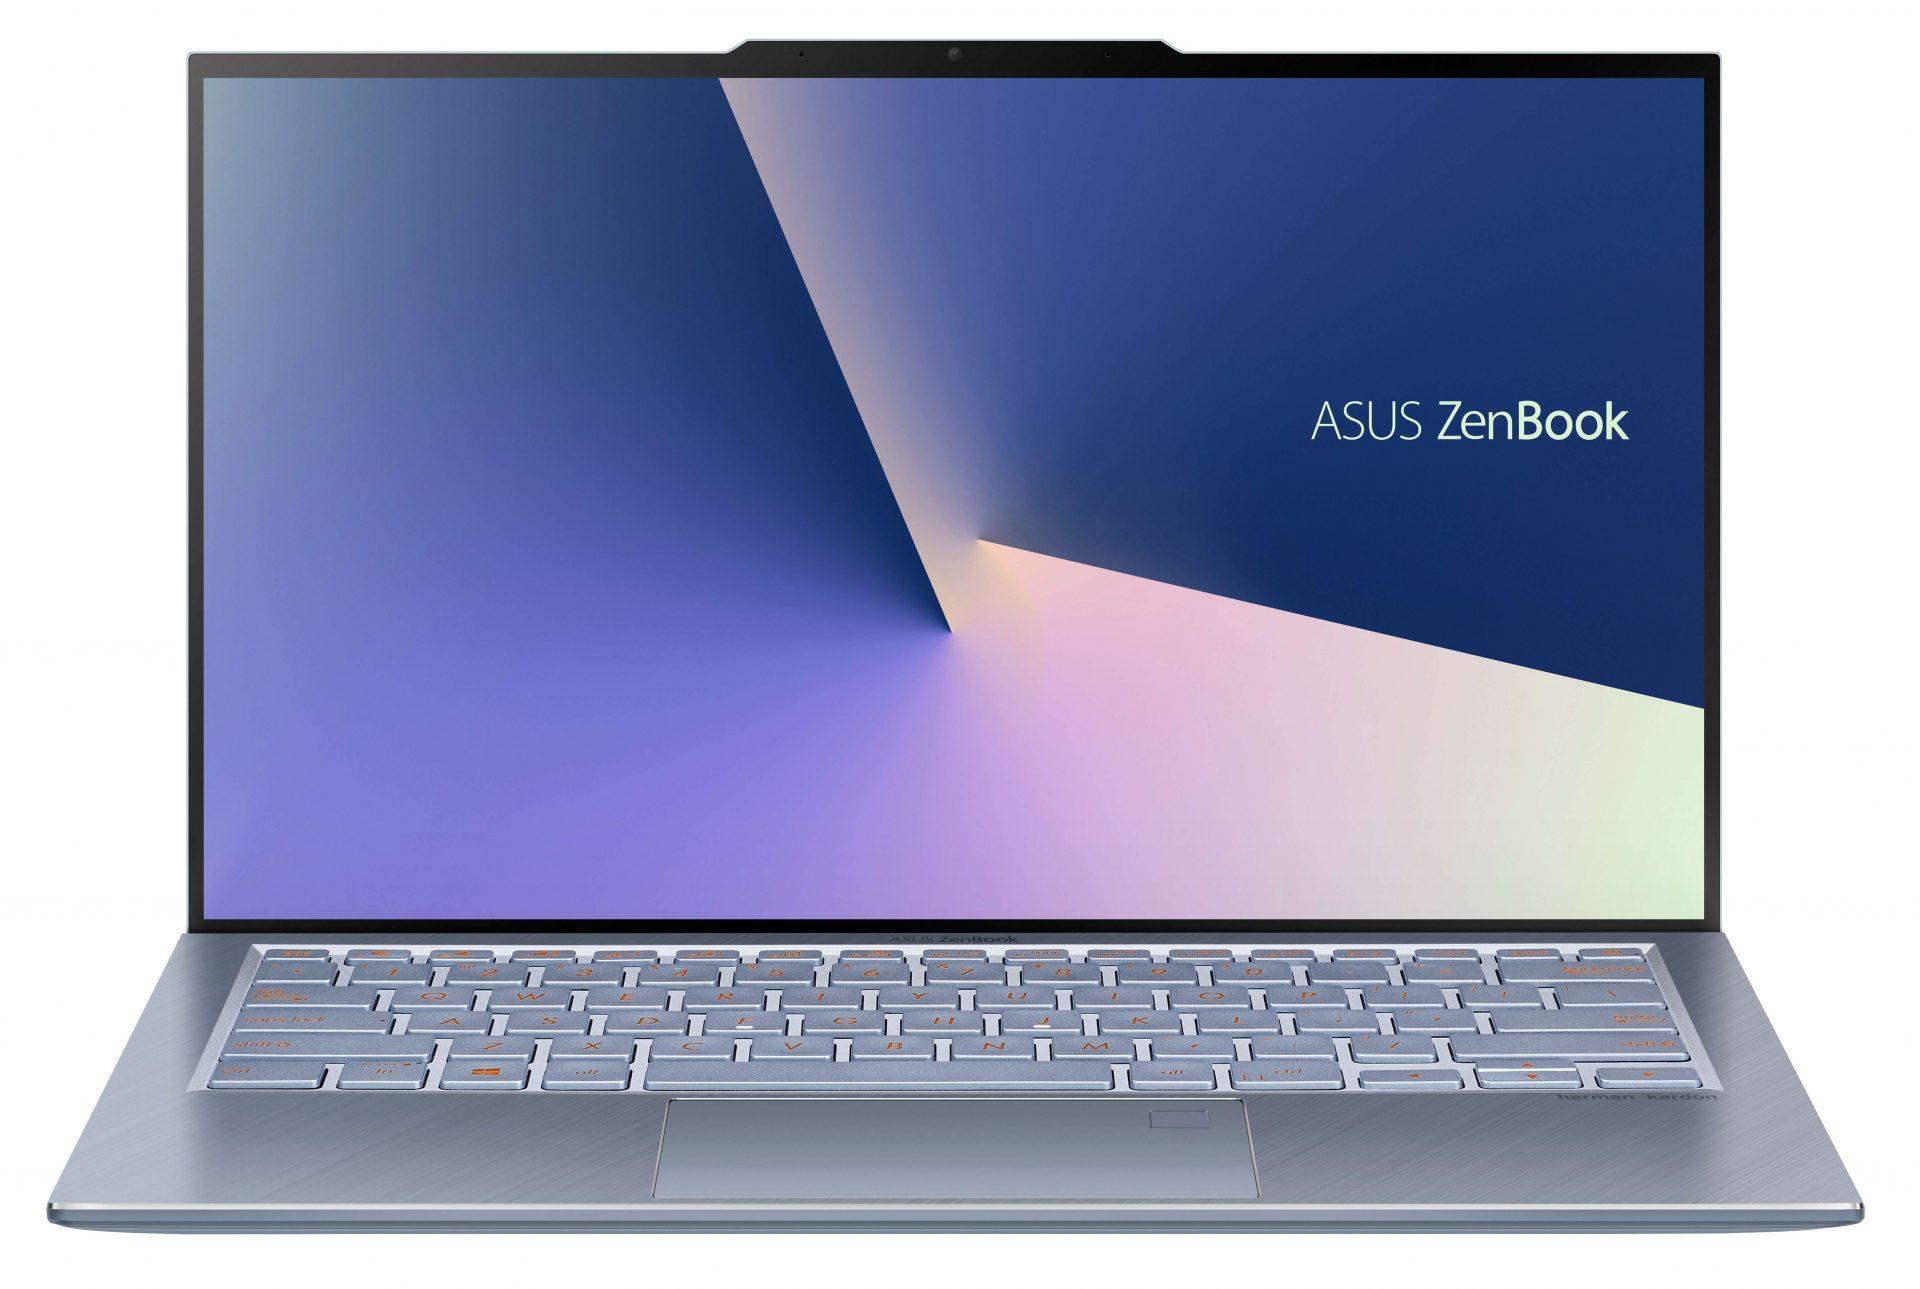 ZenBook S13 UX392 Product photo 2B Utopia Blue 05 - CES 2019: conheça as novidades da ASUS